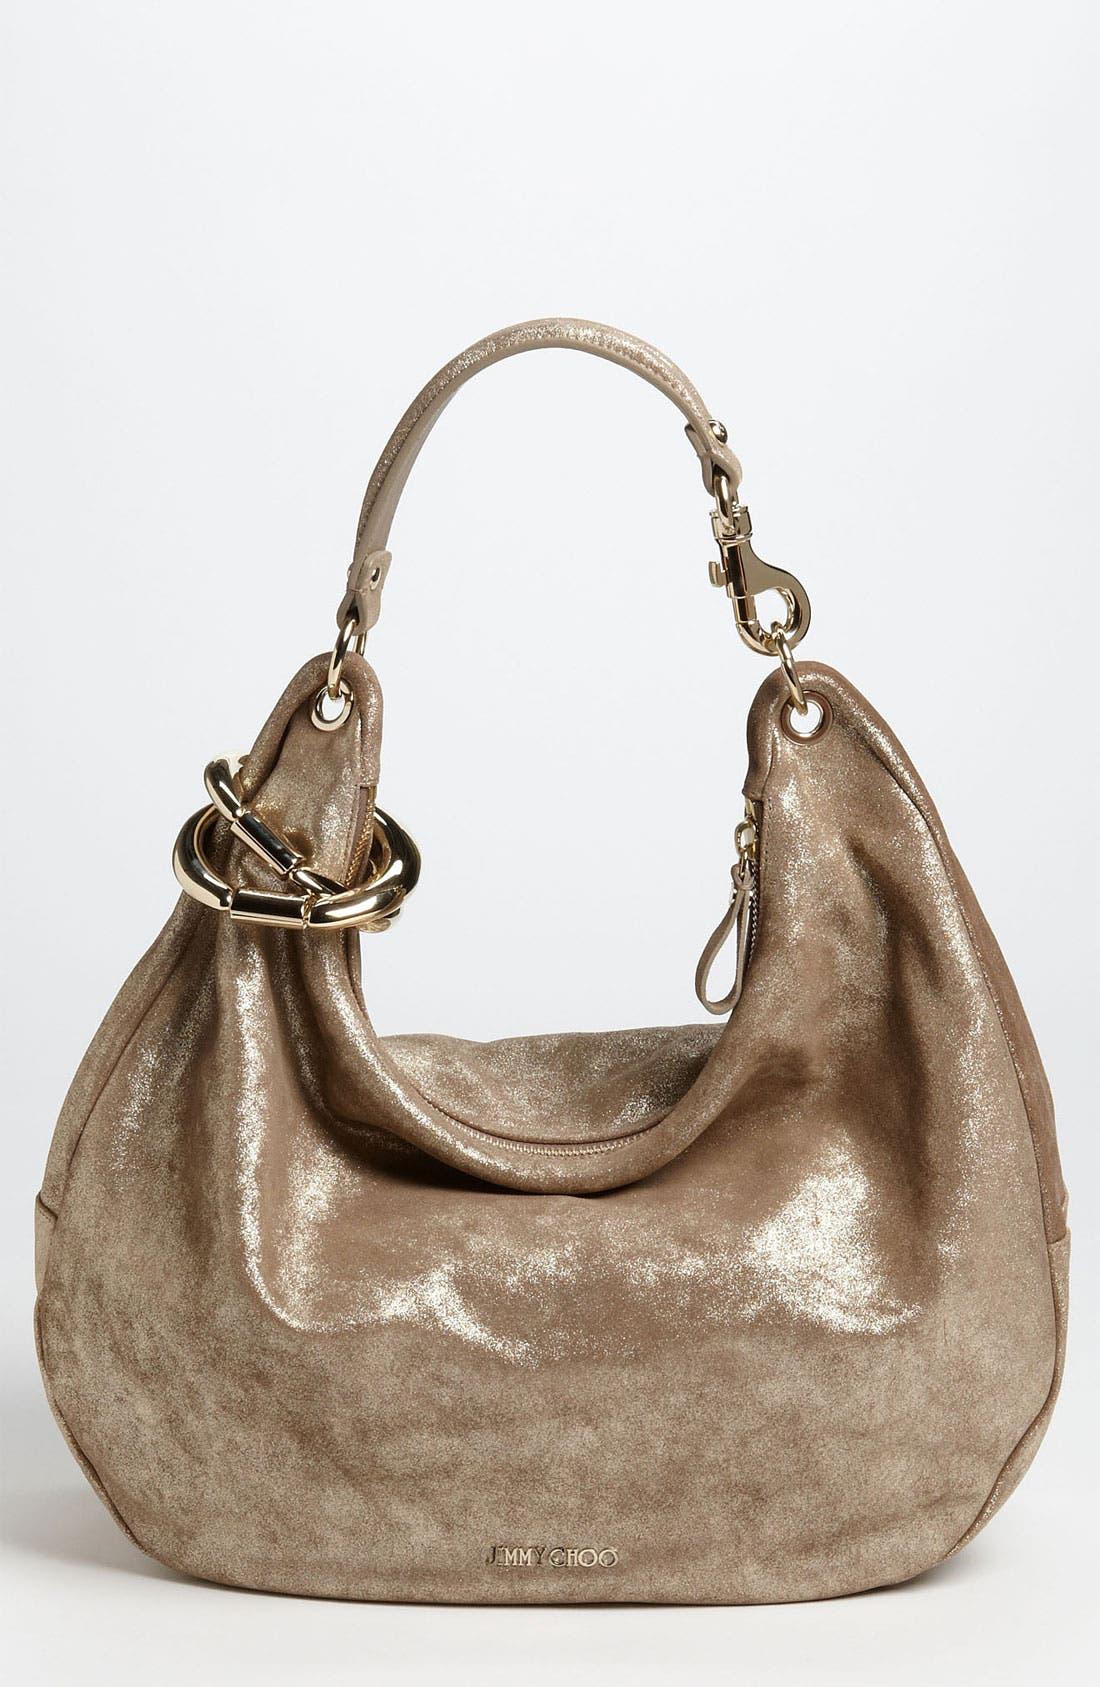 Alternate Image 1 Selected - Jimmy Choo 'Solar - Large' Metallic Leather Hobo